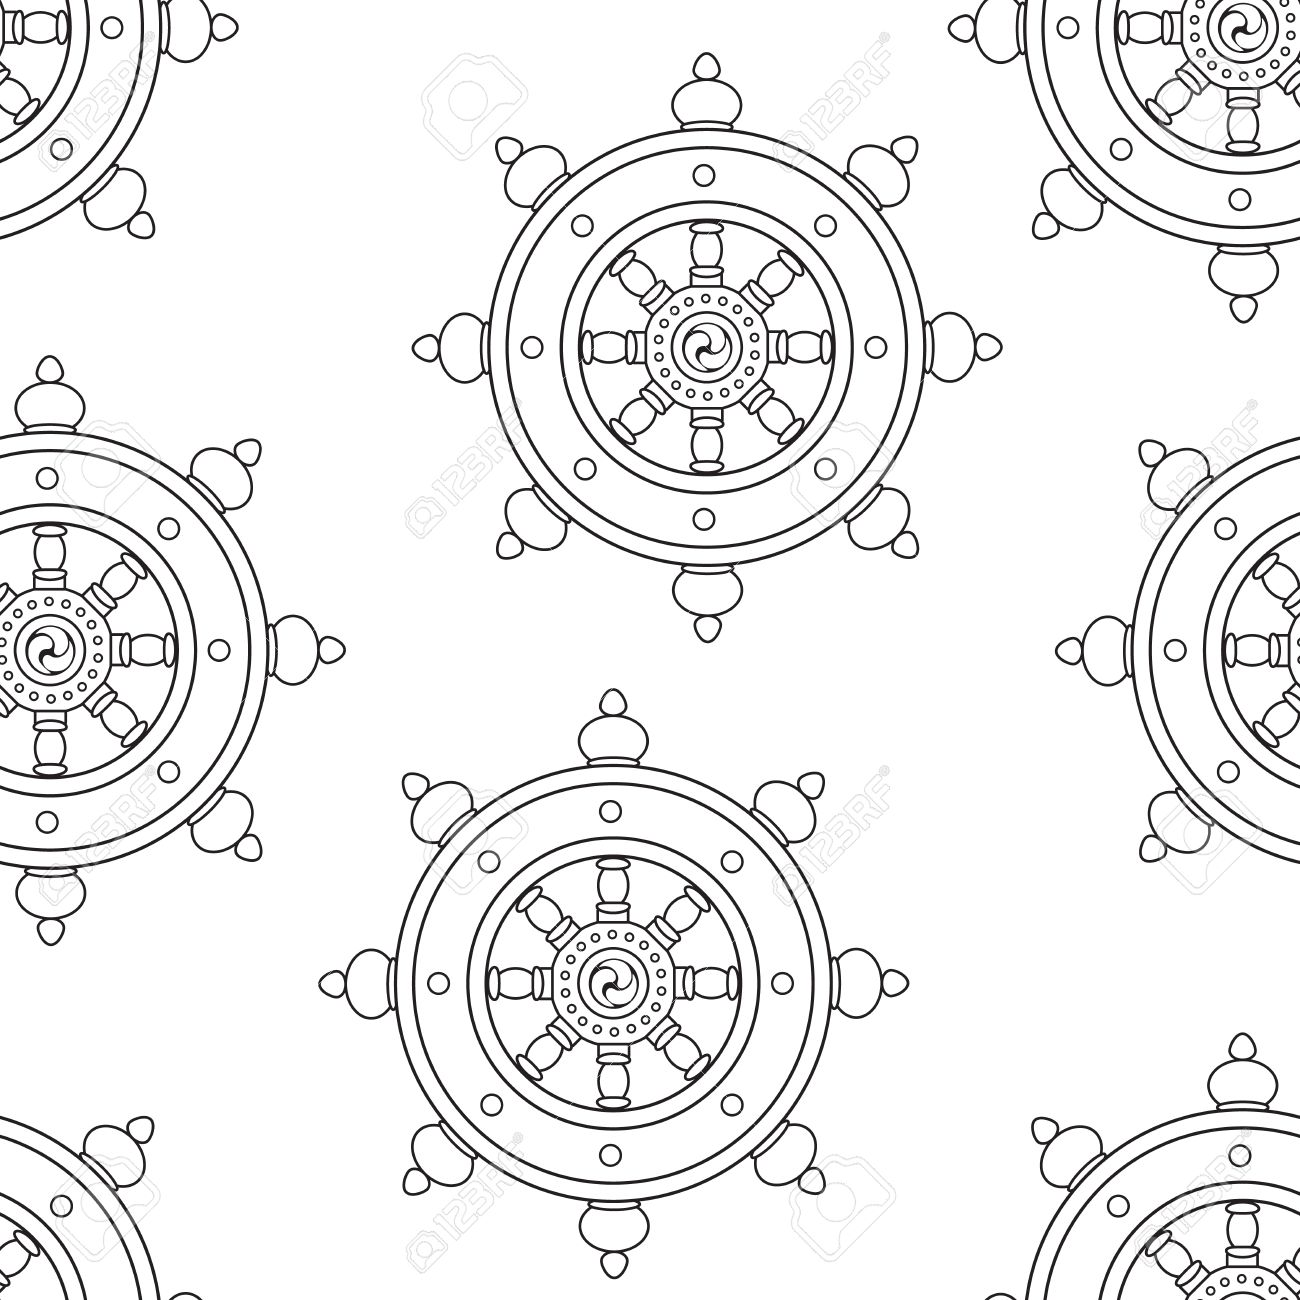 wheel of dharma pattern dharmachakra pattern buddhism royalty free